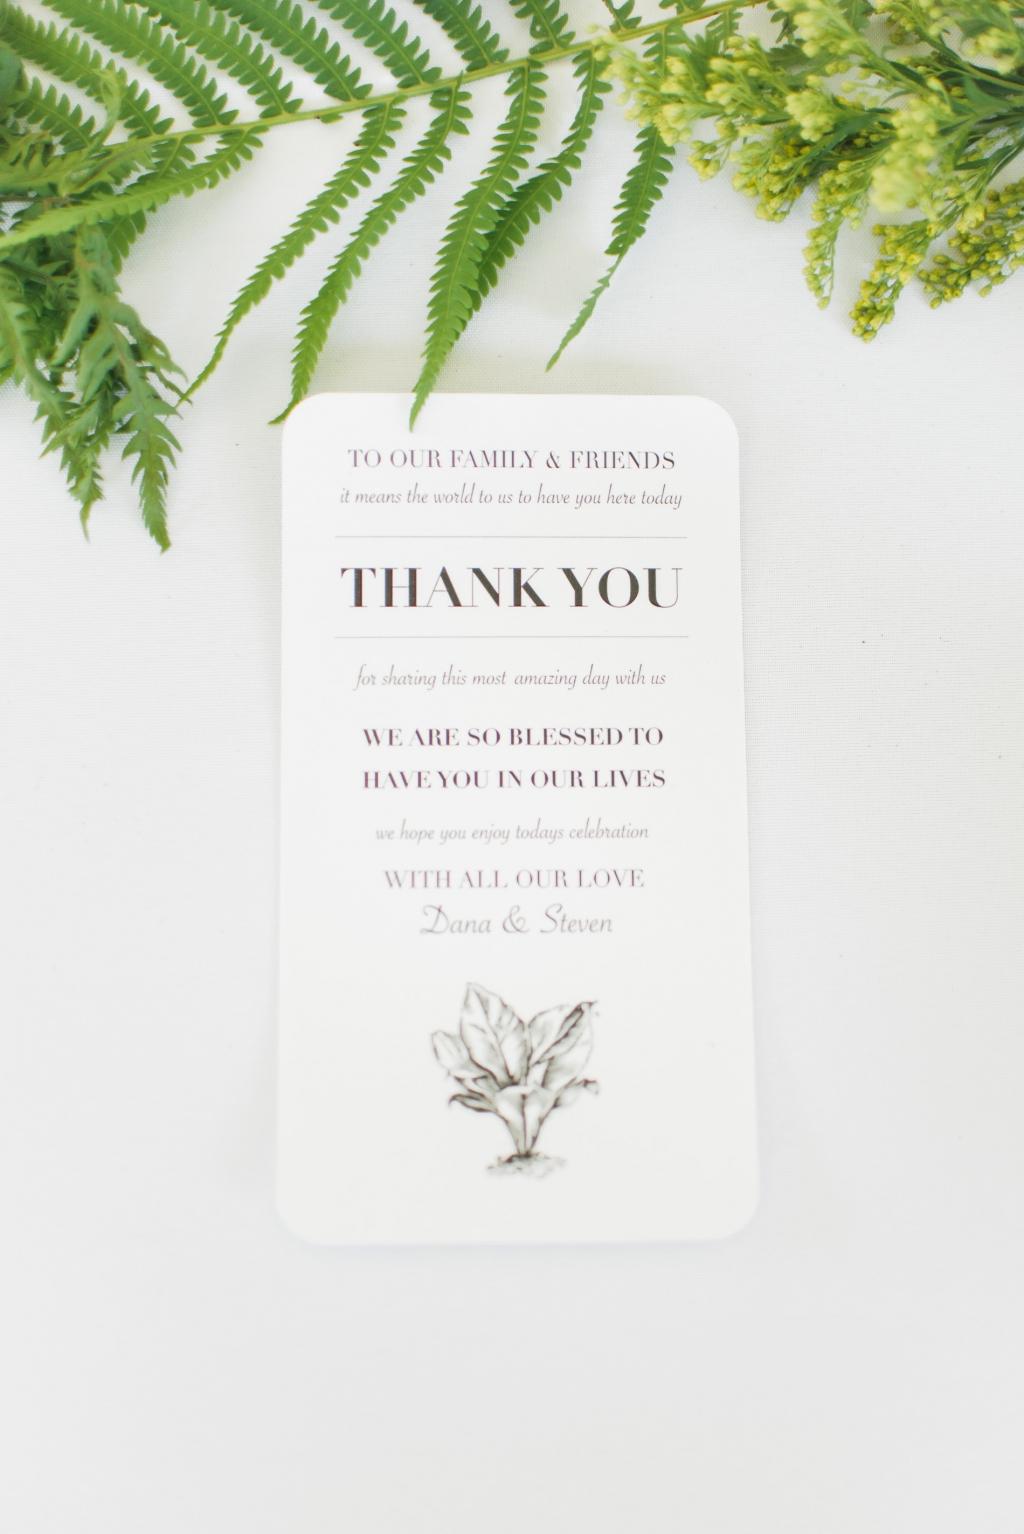 20170603_du_soleil_photographie_wedding_dana&steven_details-76